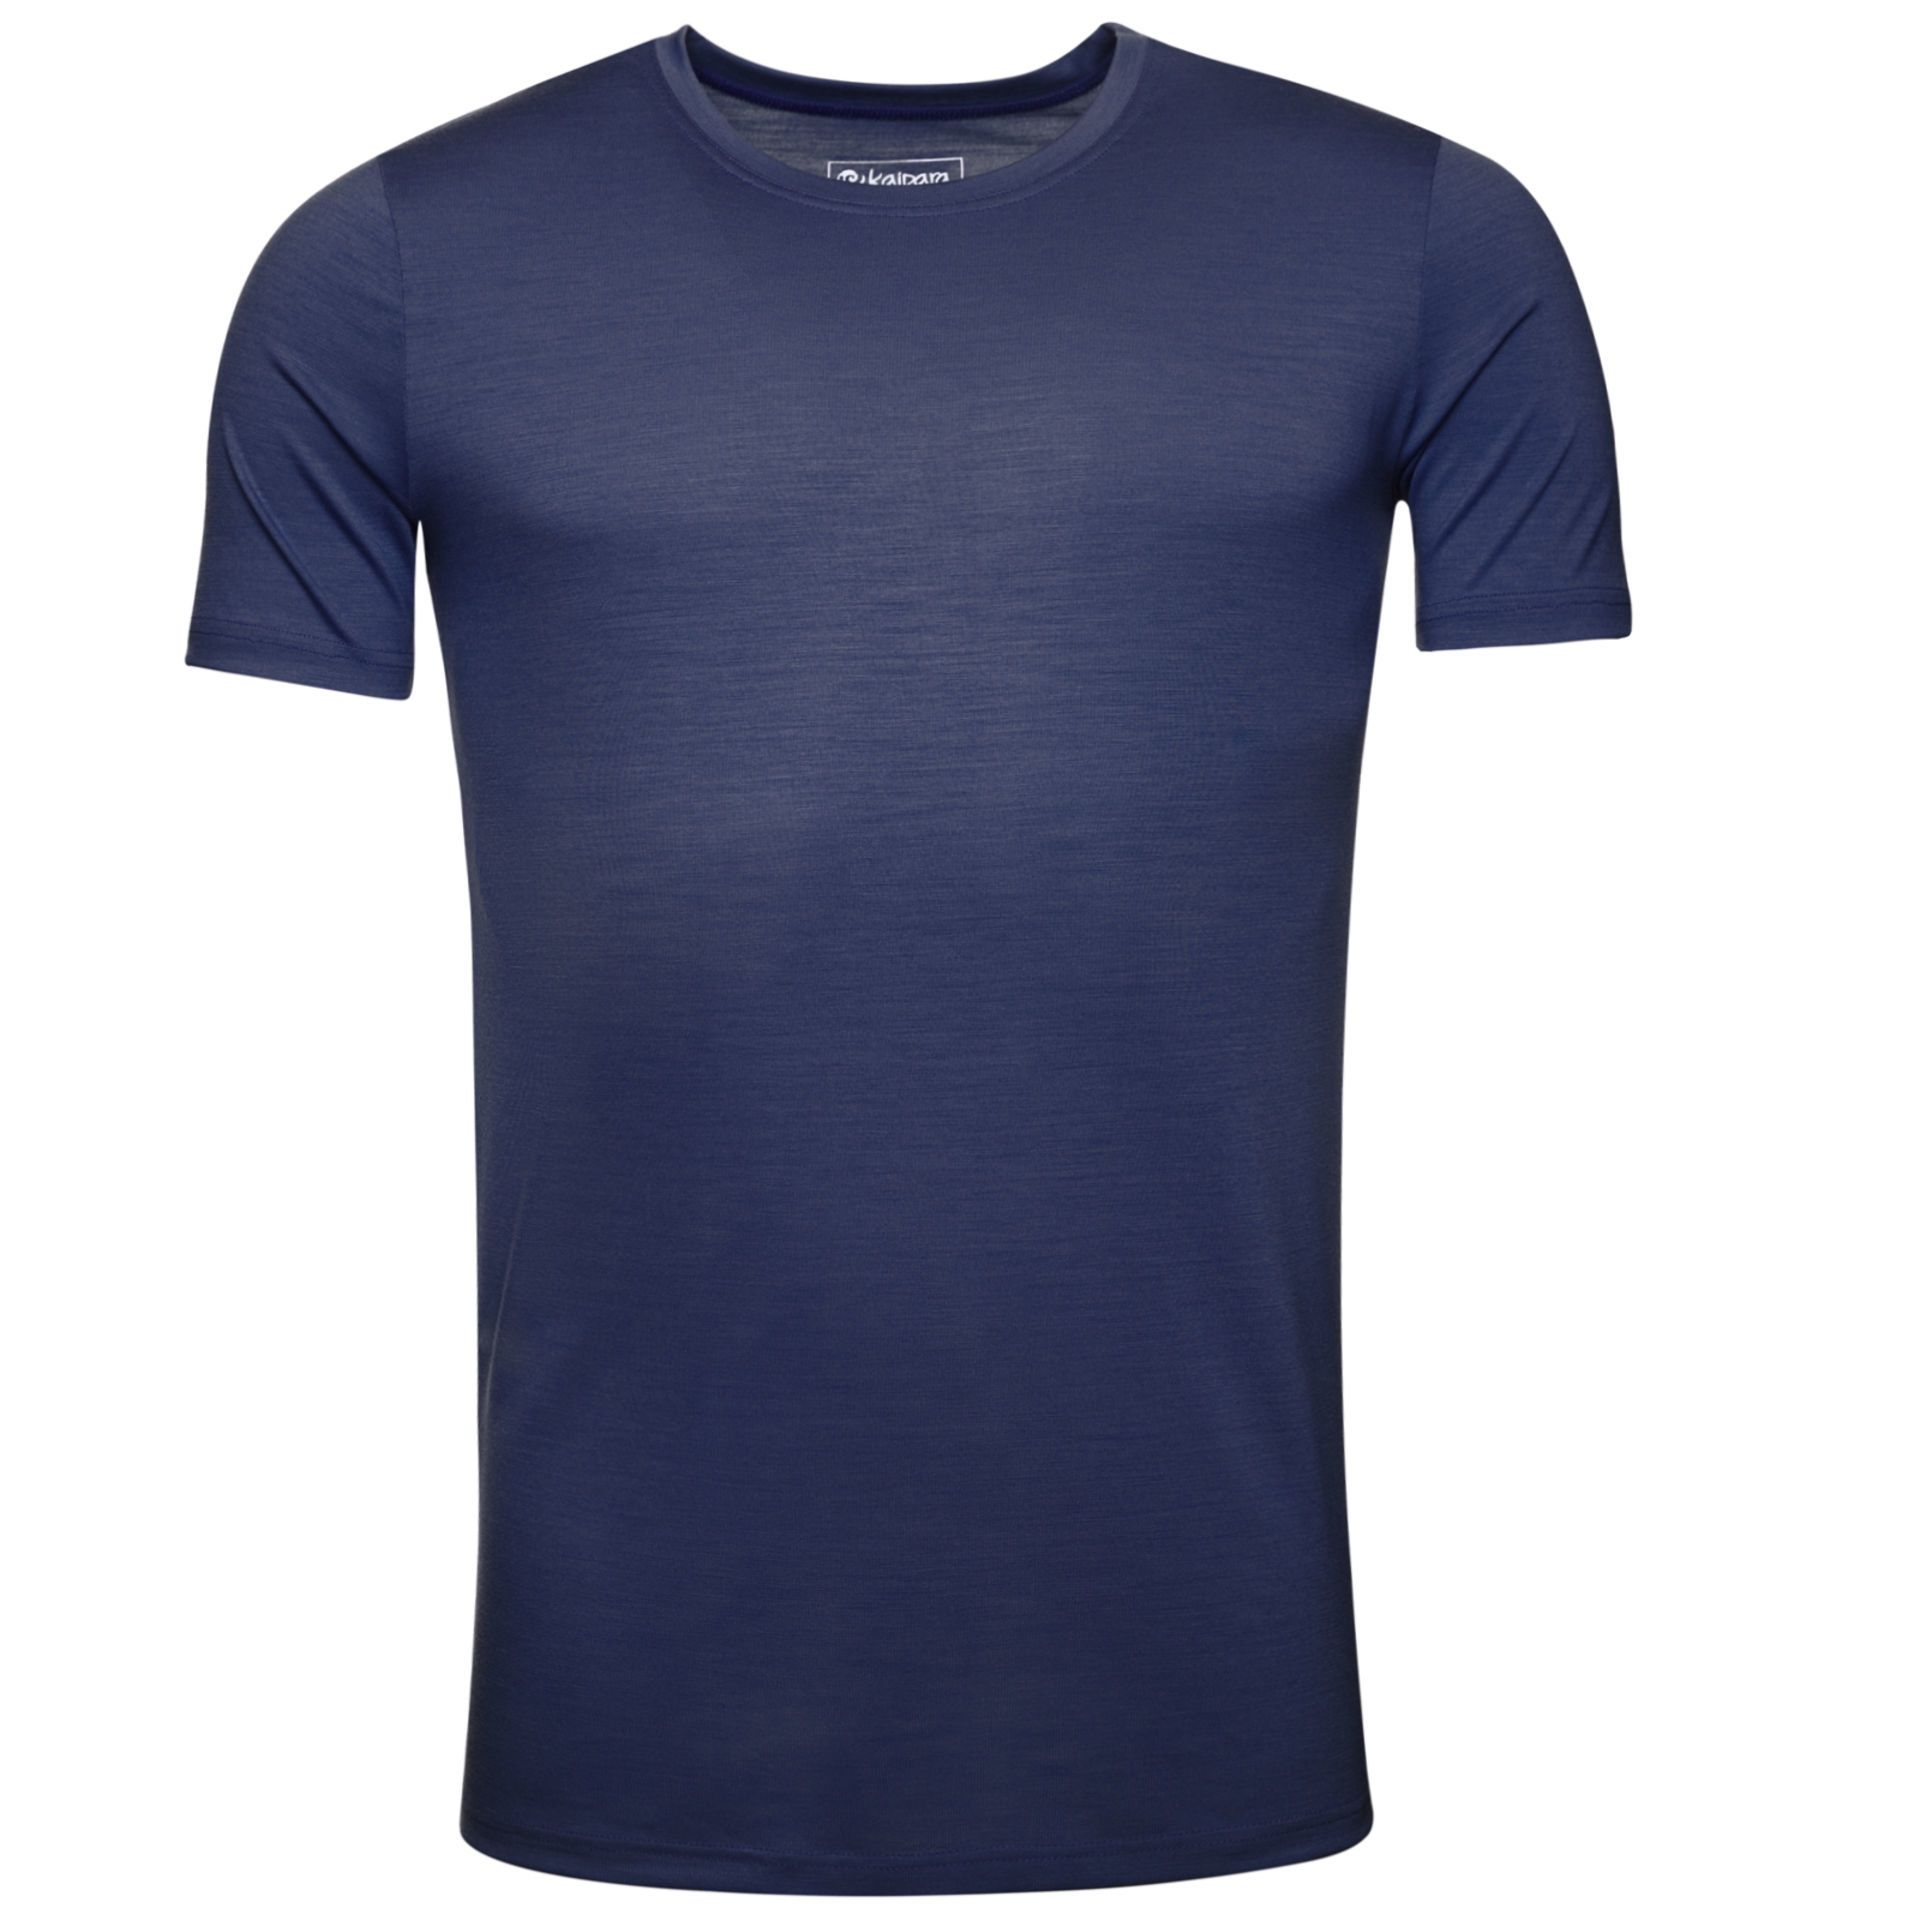 URBAN LIMITED Merino T-Shirt Herren Kurzarm Slimfit 200